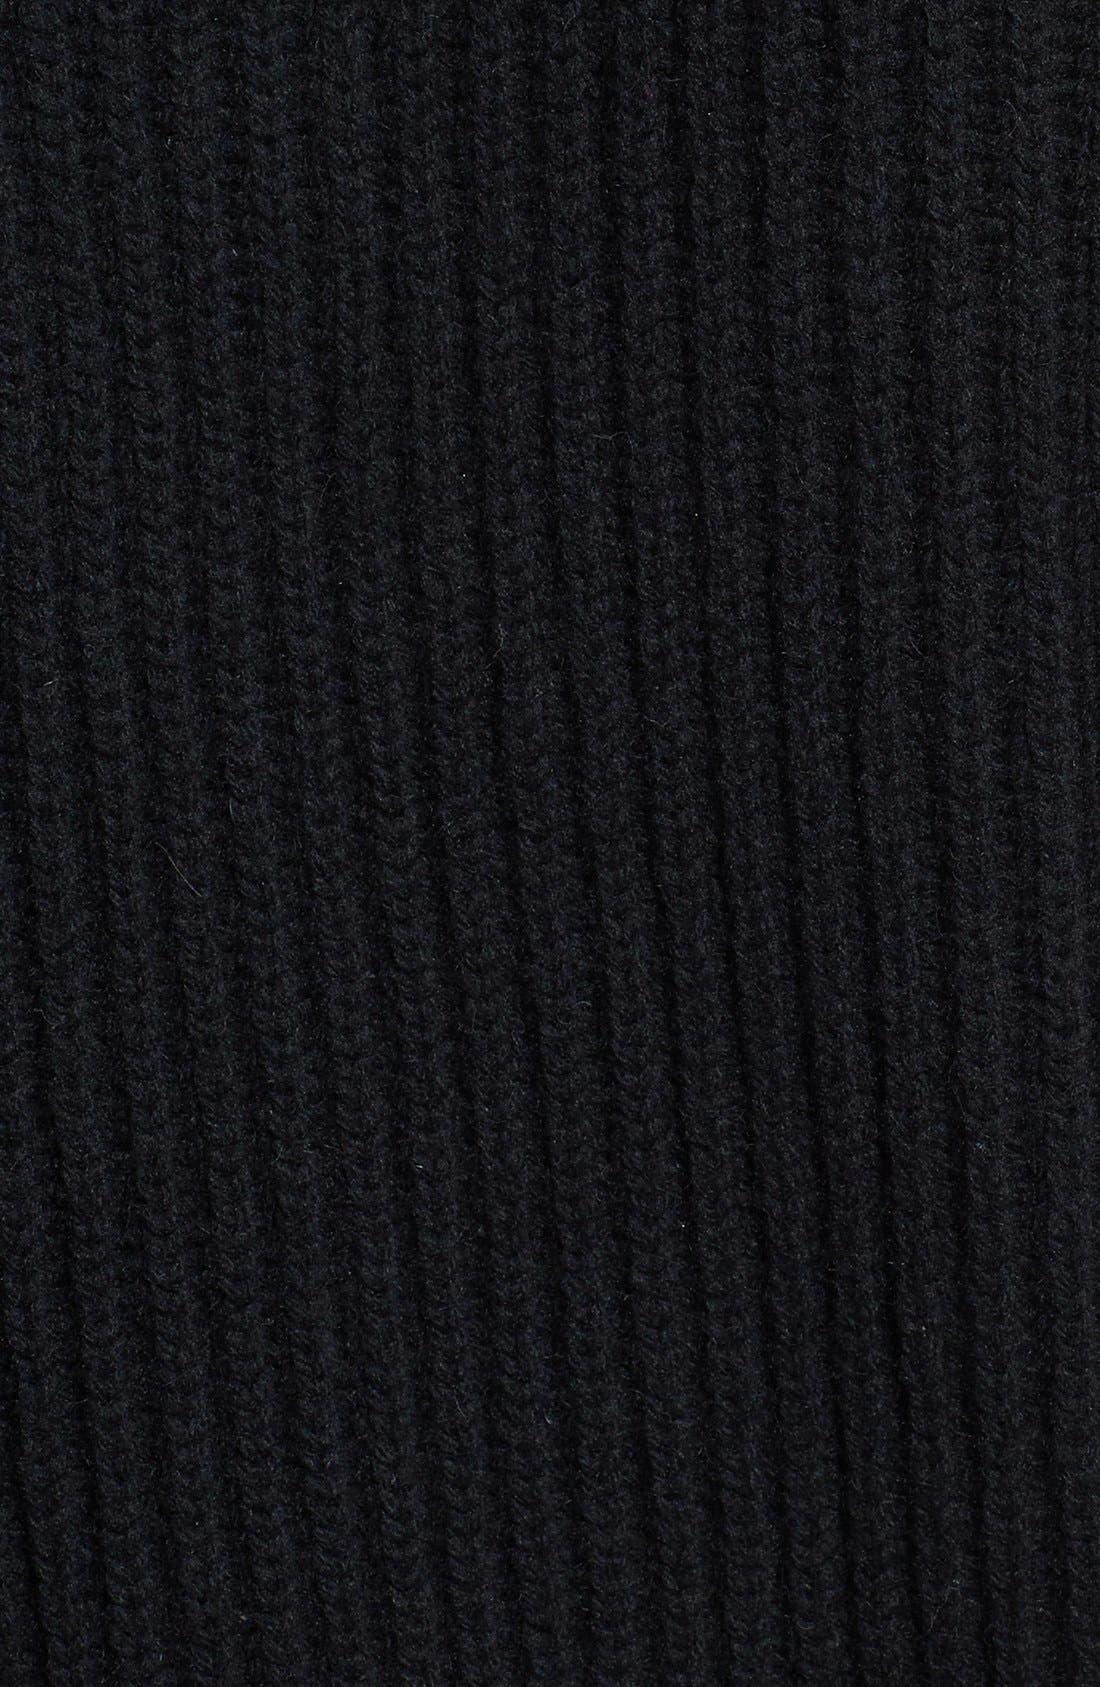 Alternate Image 3  - French Connection 'Myrrh Patch Melton' Sweater Jacket